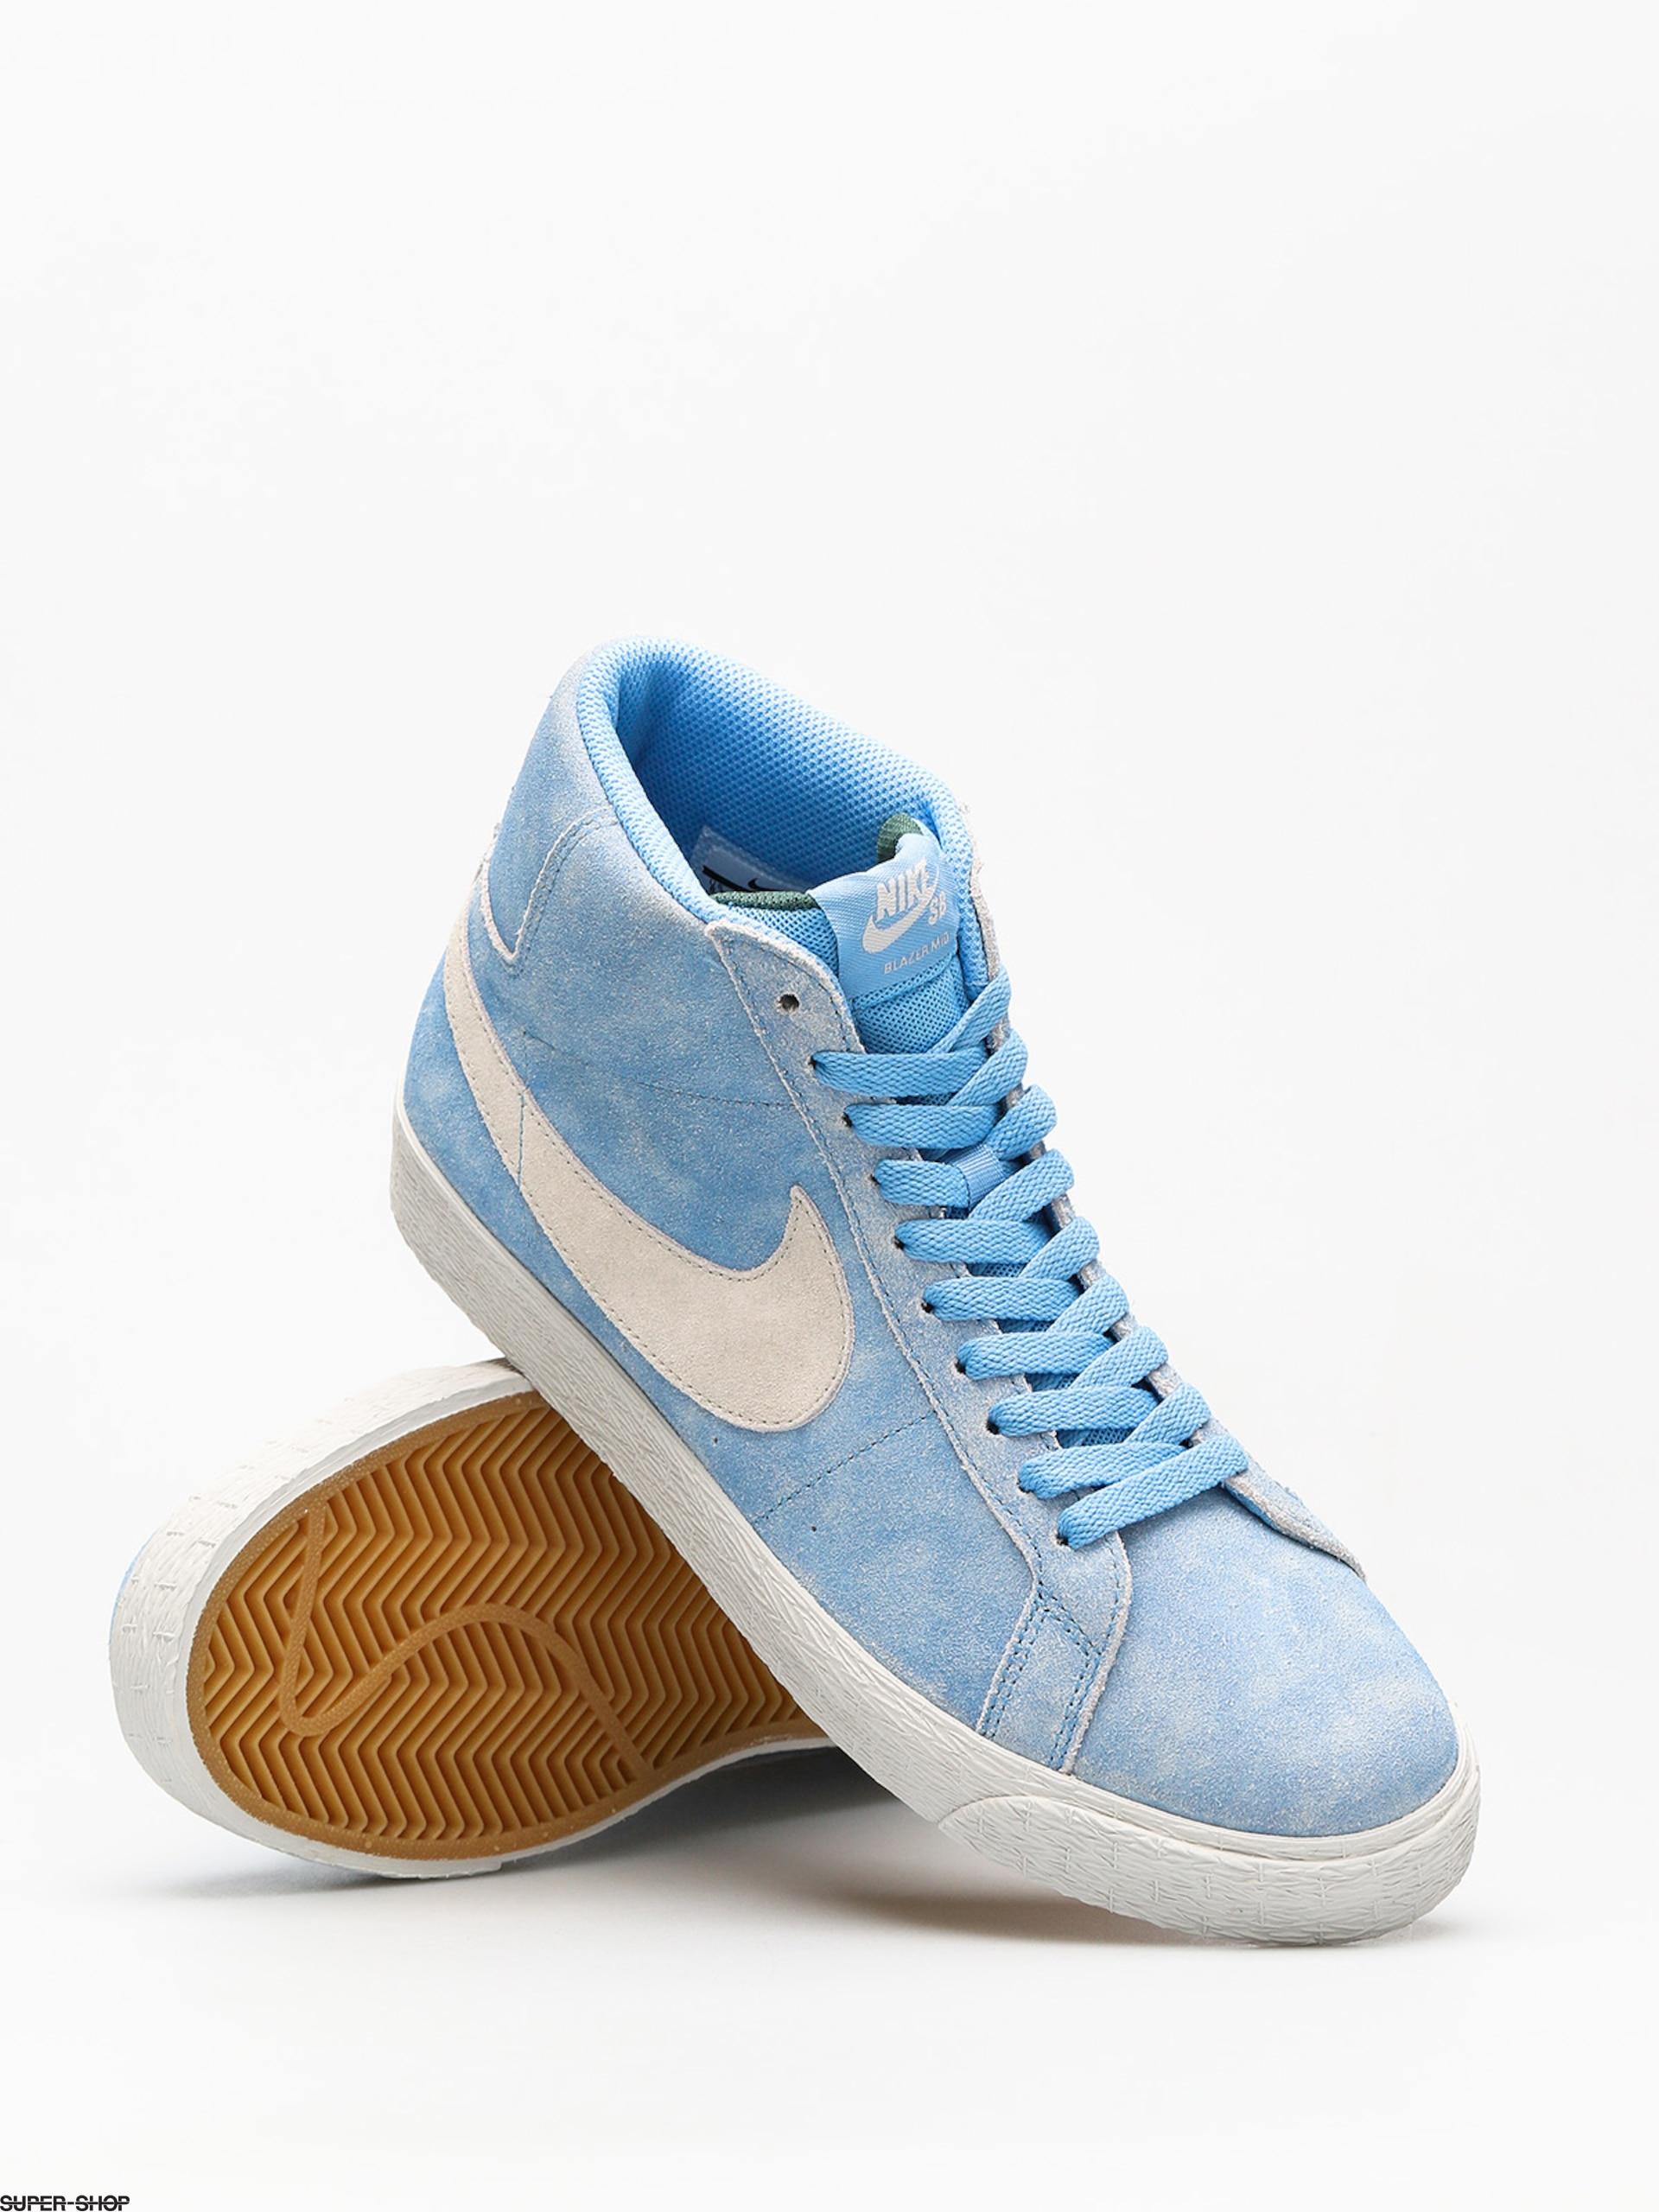 216ad57eb299f Nike SB Shoes Sb Zoom Blazer Mid (university blue light bone habanero red)